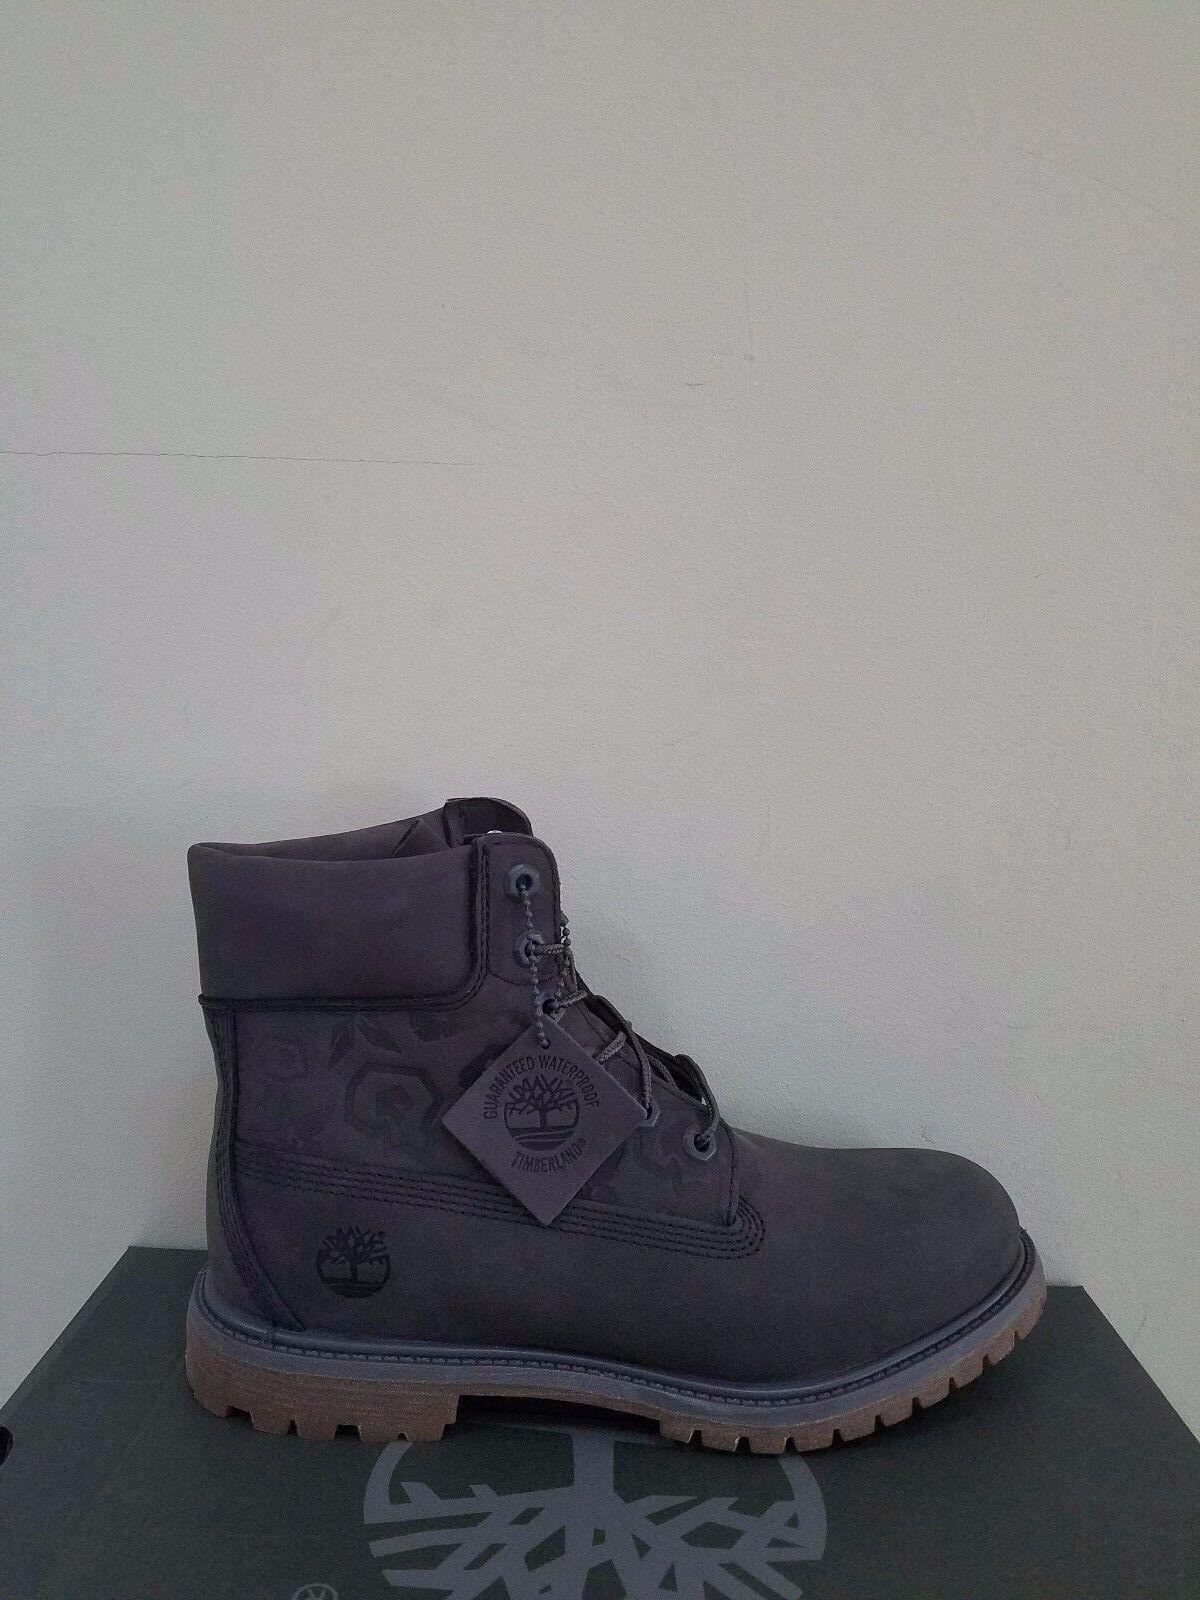 "Timberland Women's Embossed 6 inch"" Double Sole Premium Waterproof Boots NIB"